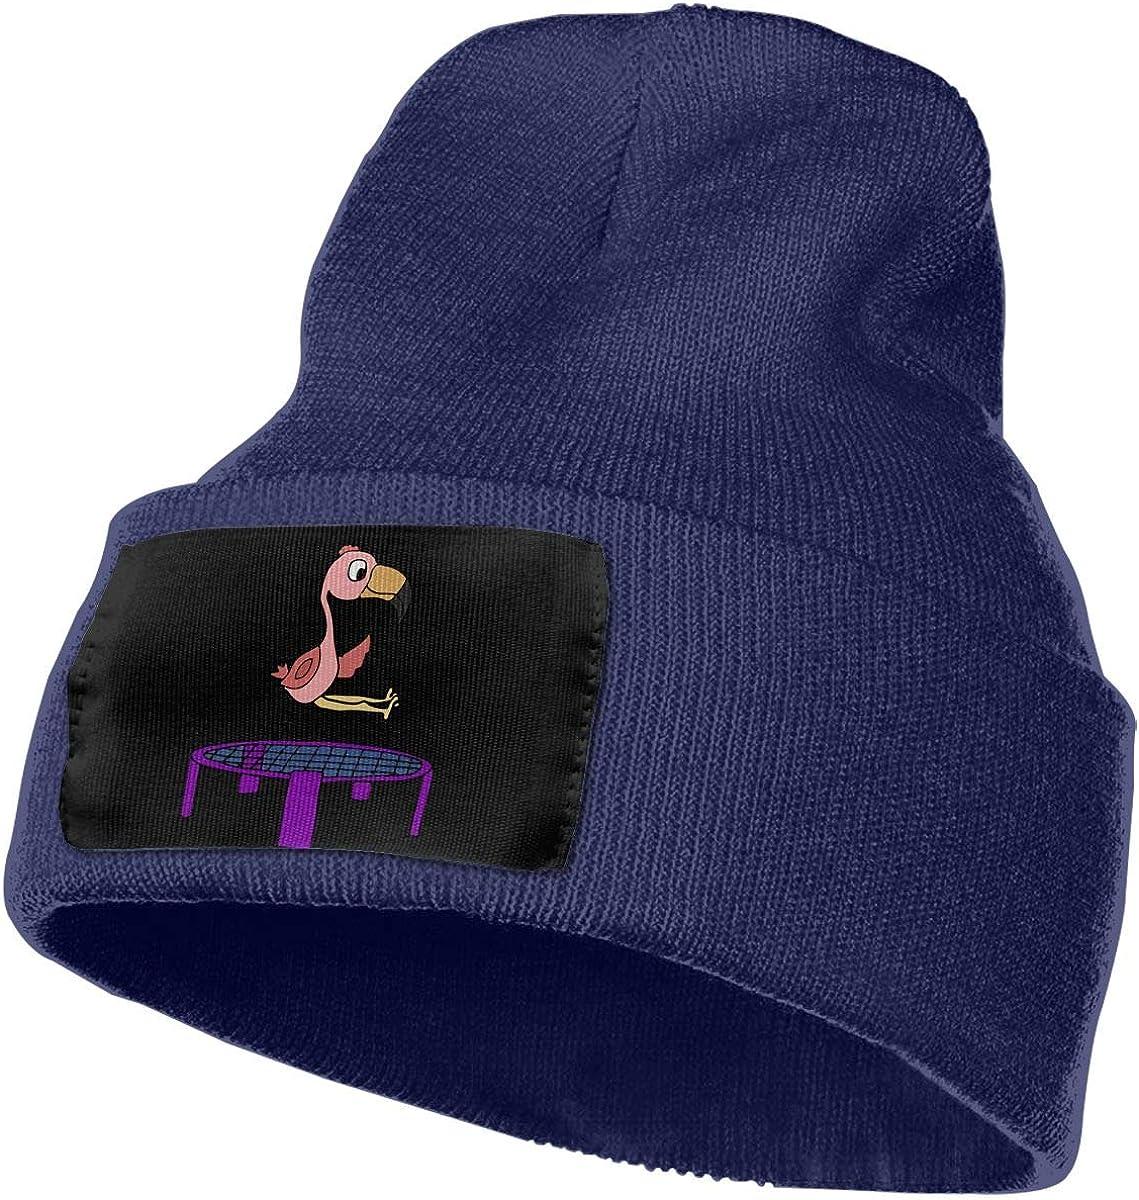 Cute Pink Flamingo Bird Men /& Women Knit Hats Stretchy /& Soft Ski Cap Beanie